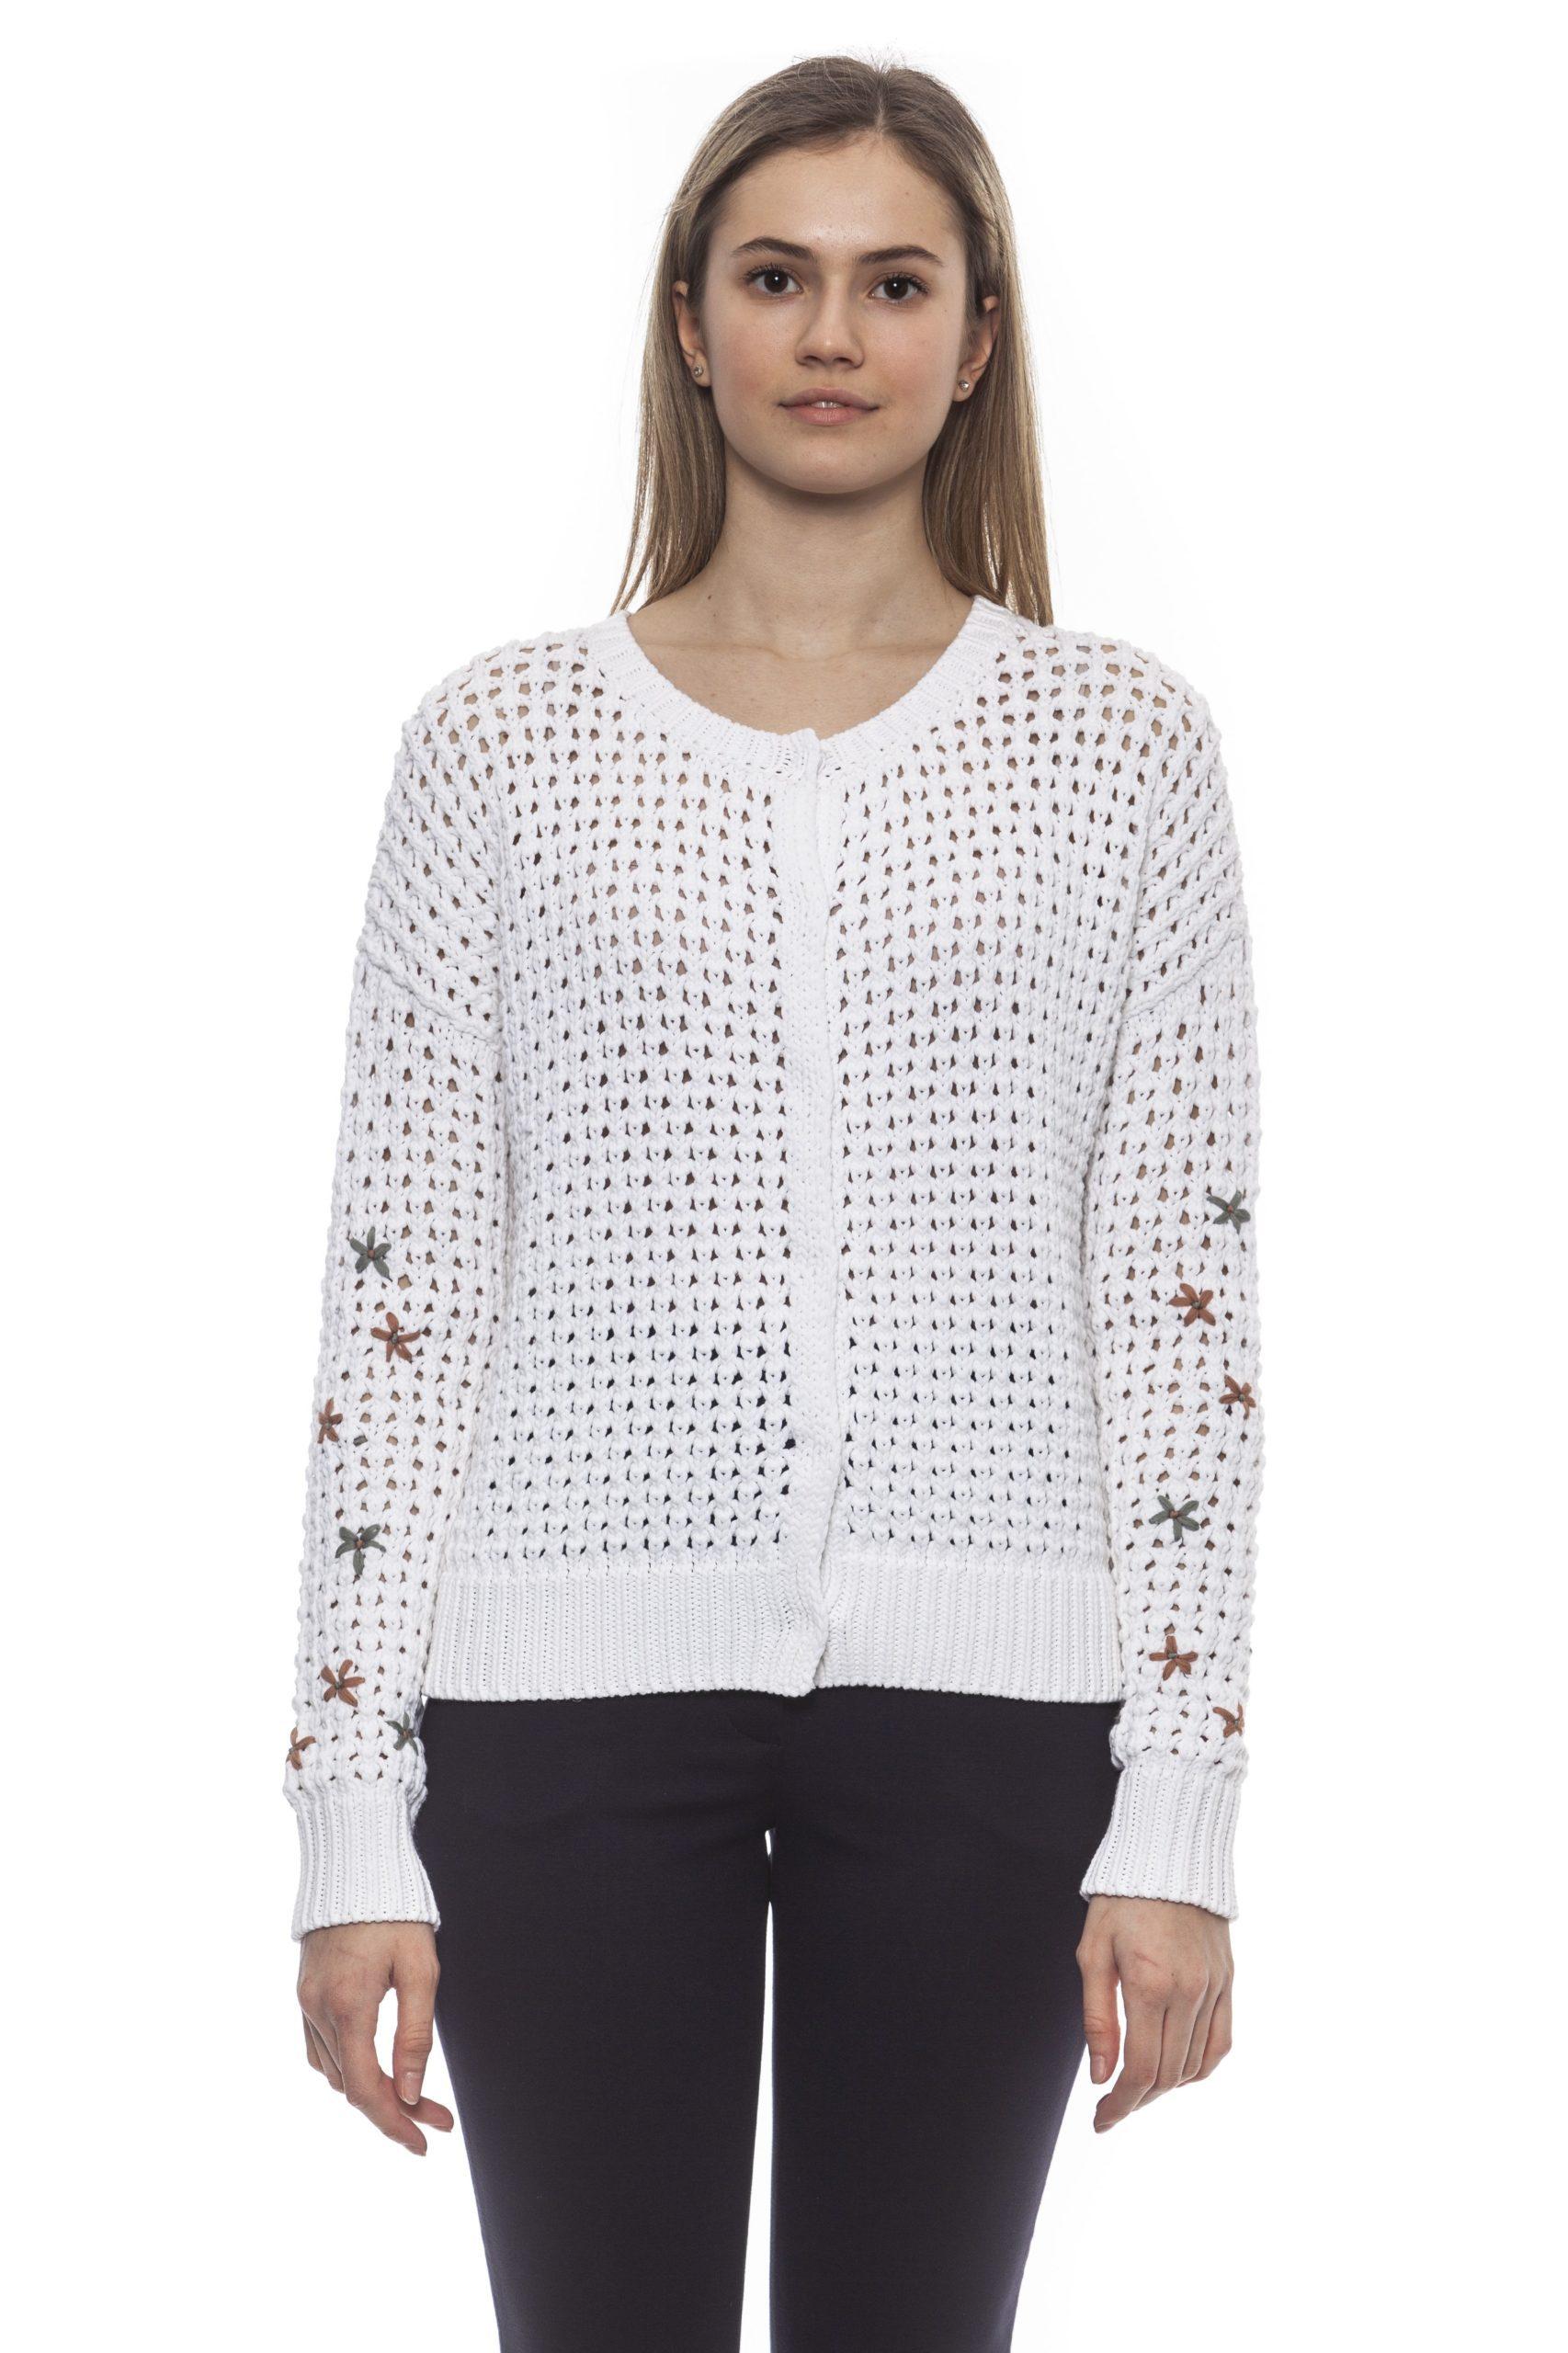 Peserico Women's D Bianco Sweater White PE1383075 - IT42 | S